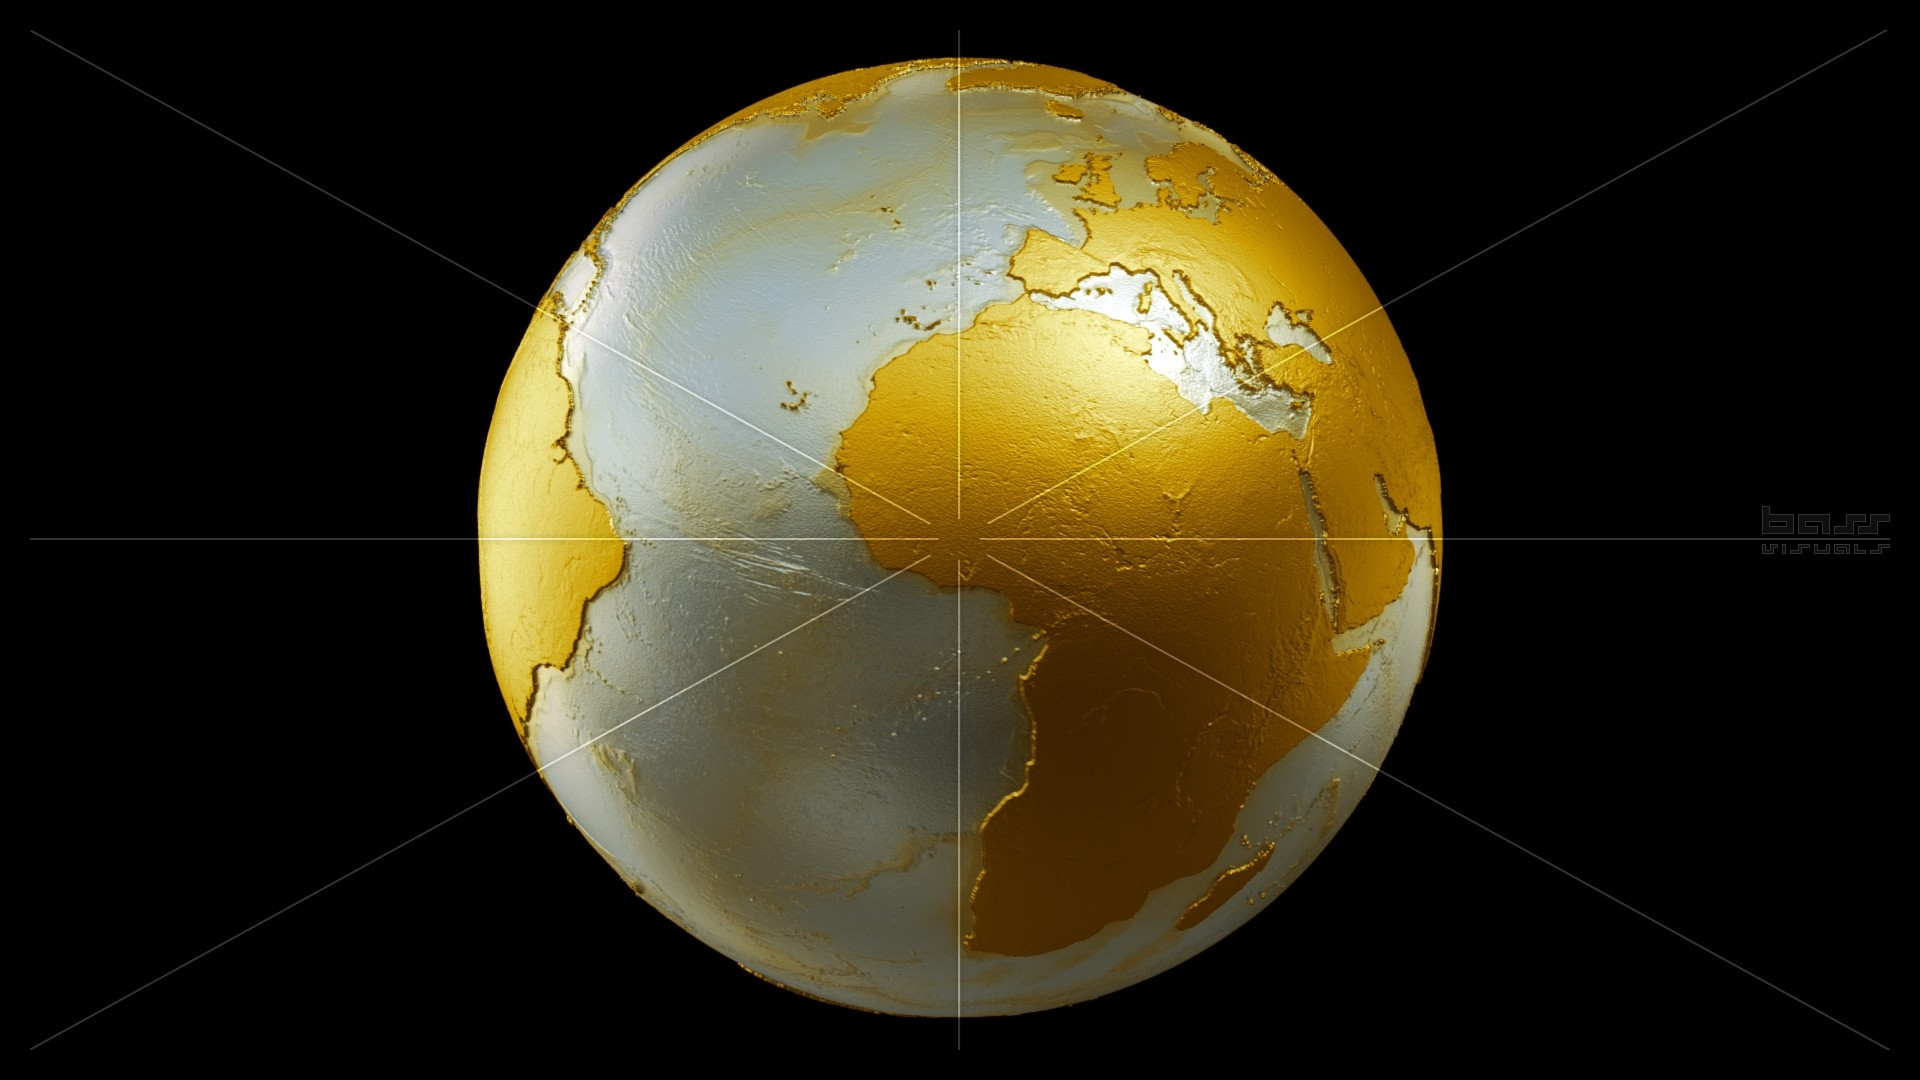 Wallpaper earth, globe, planet, gold